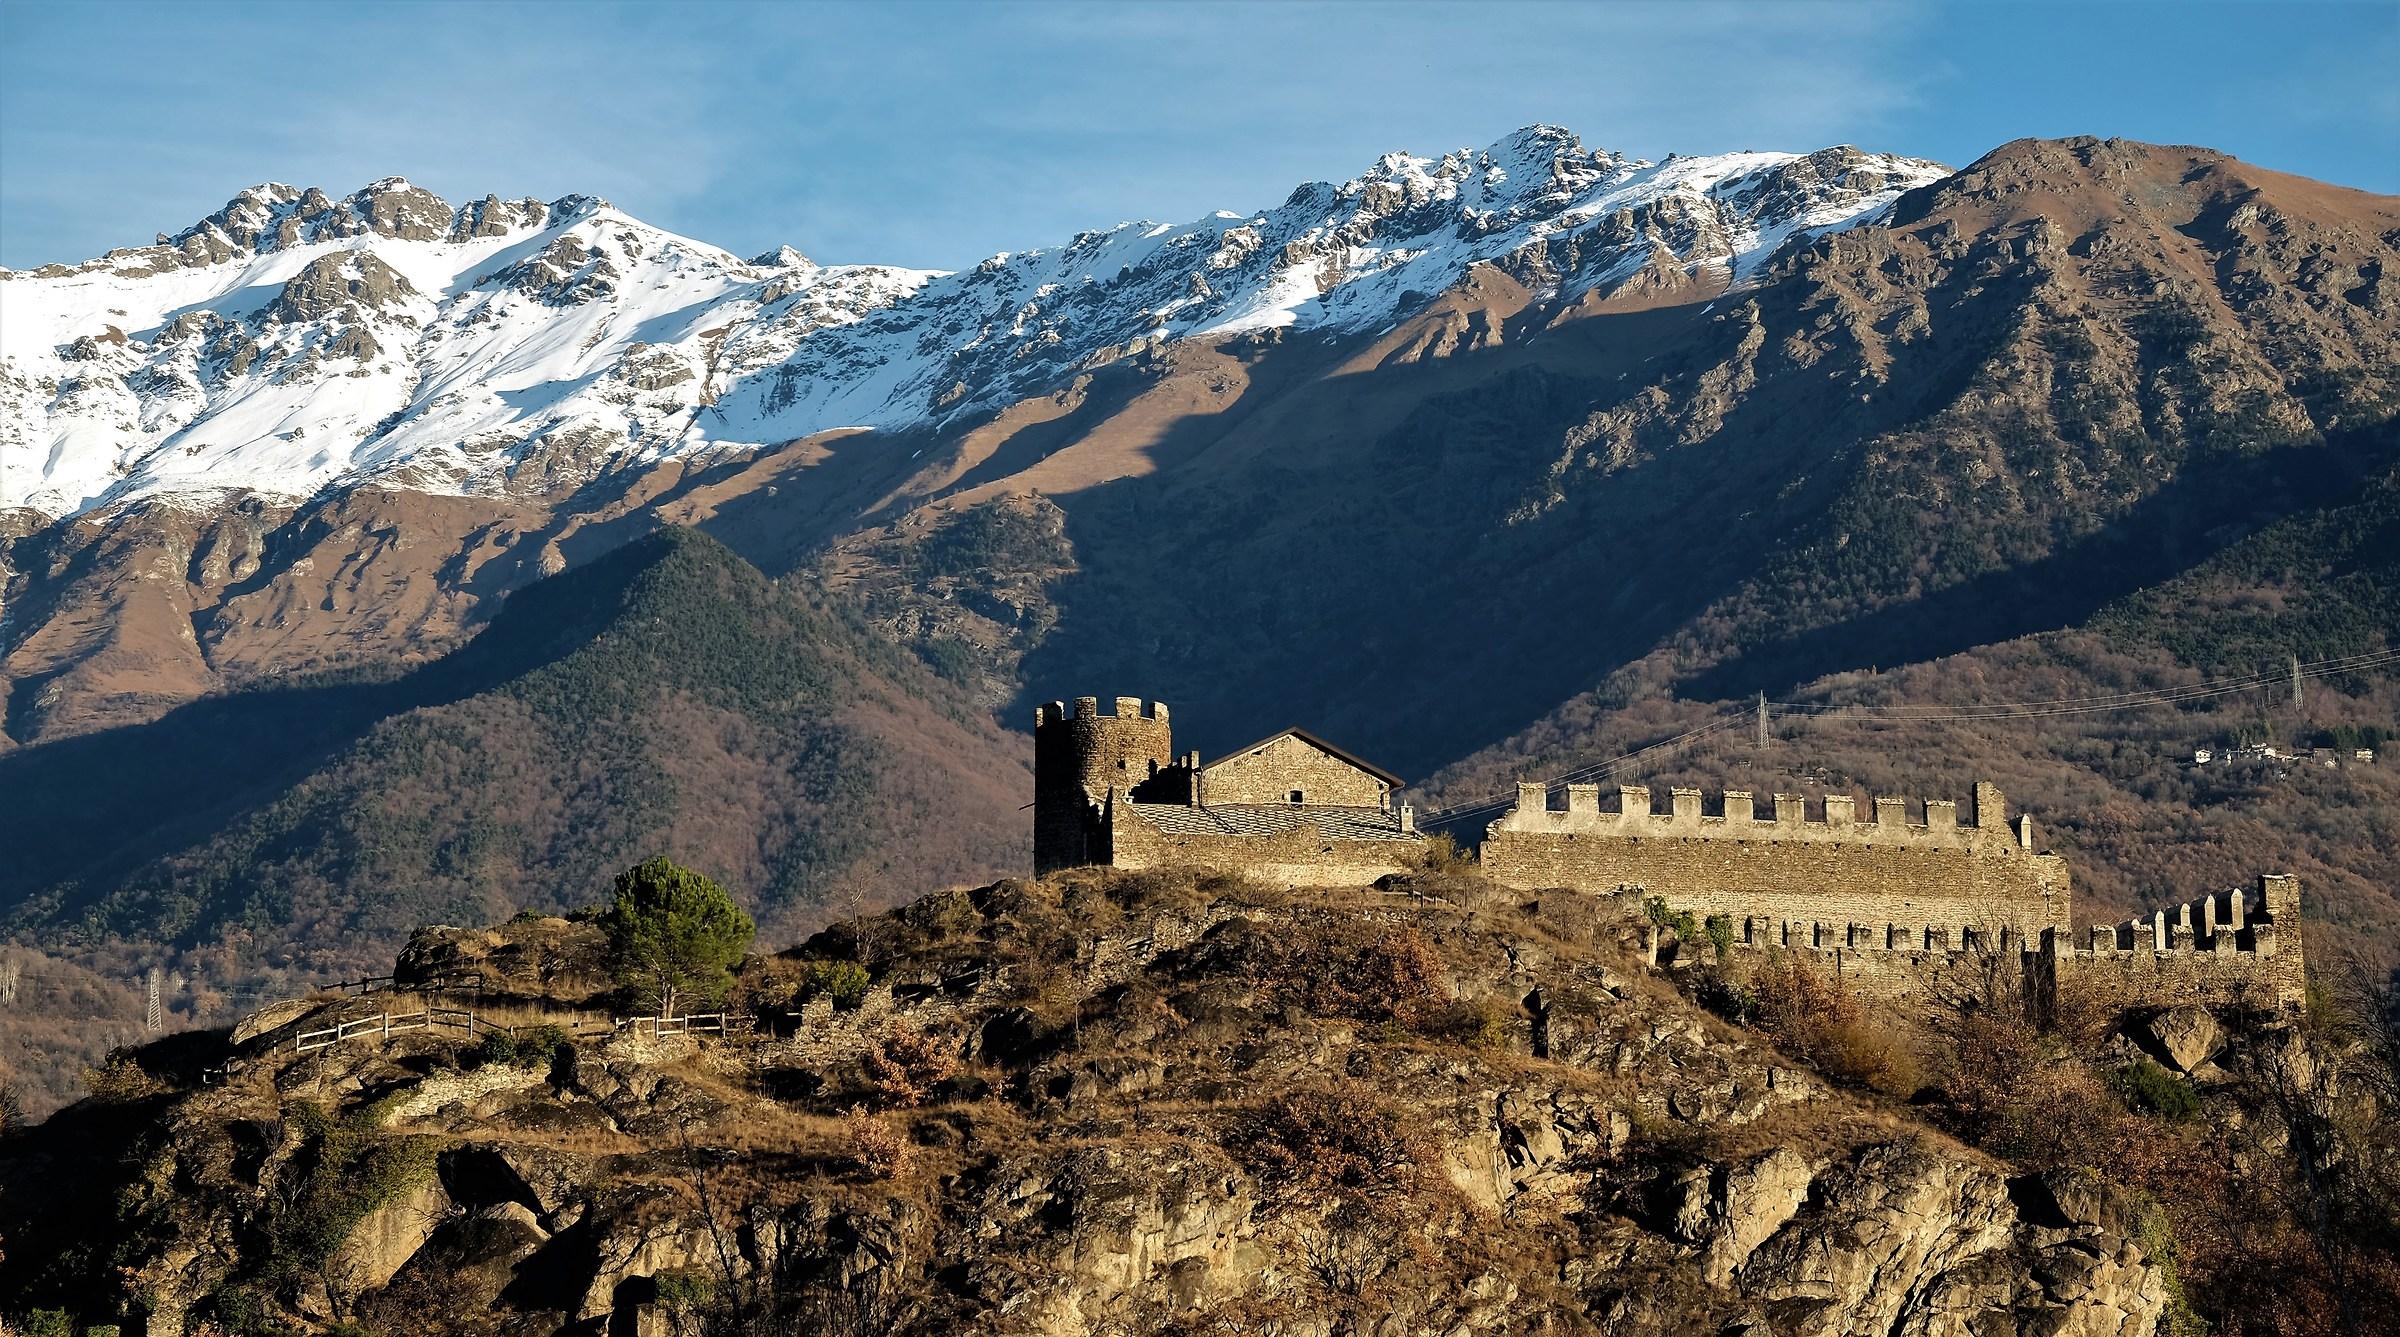 ruins of the castle of S.Giorio...